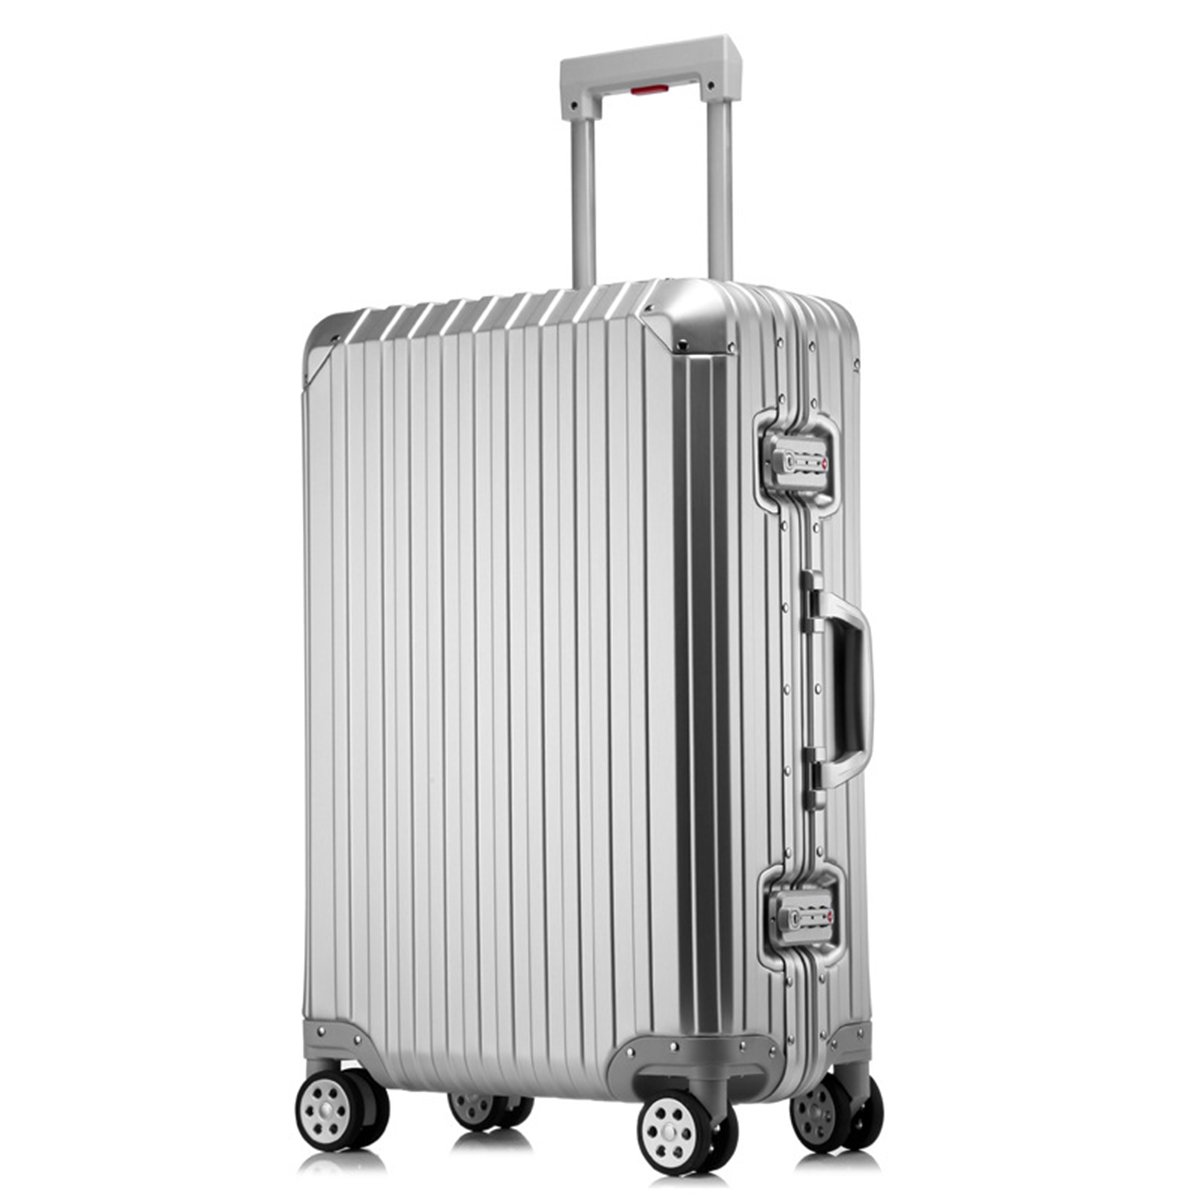 sindermore 100% Aluminum luggage suitcase (20, Silver)